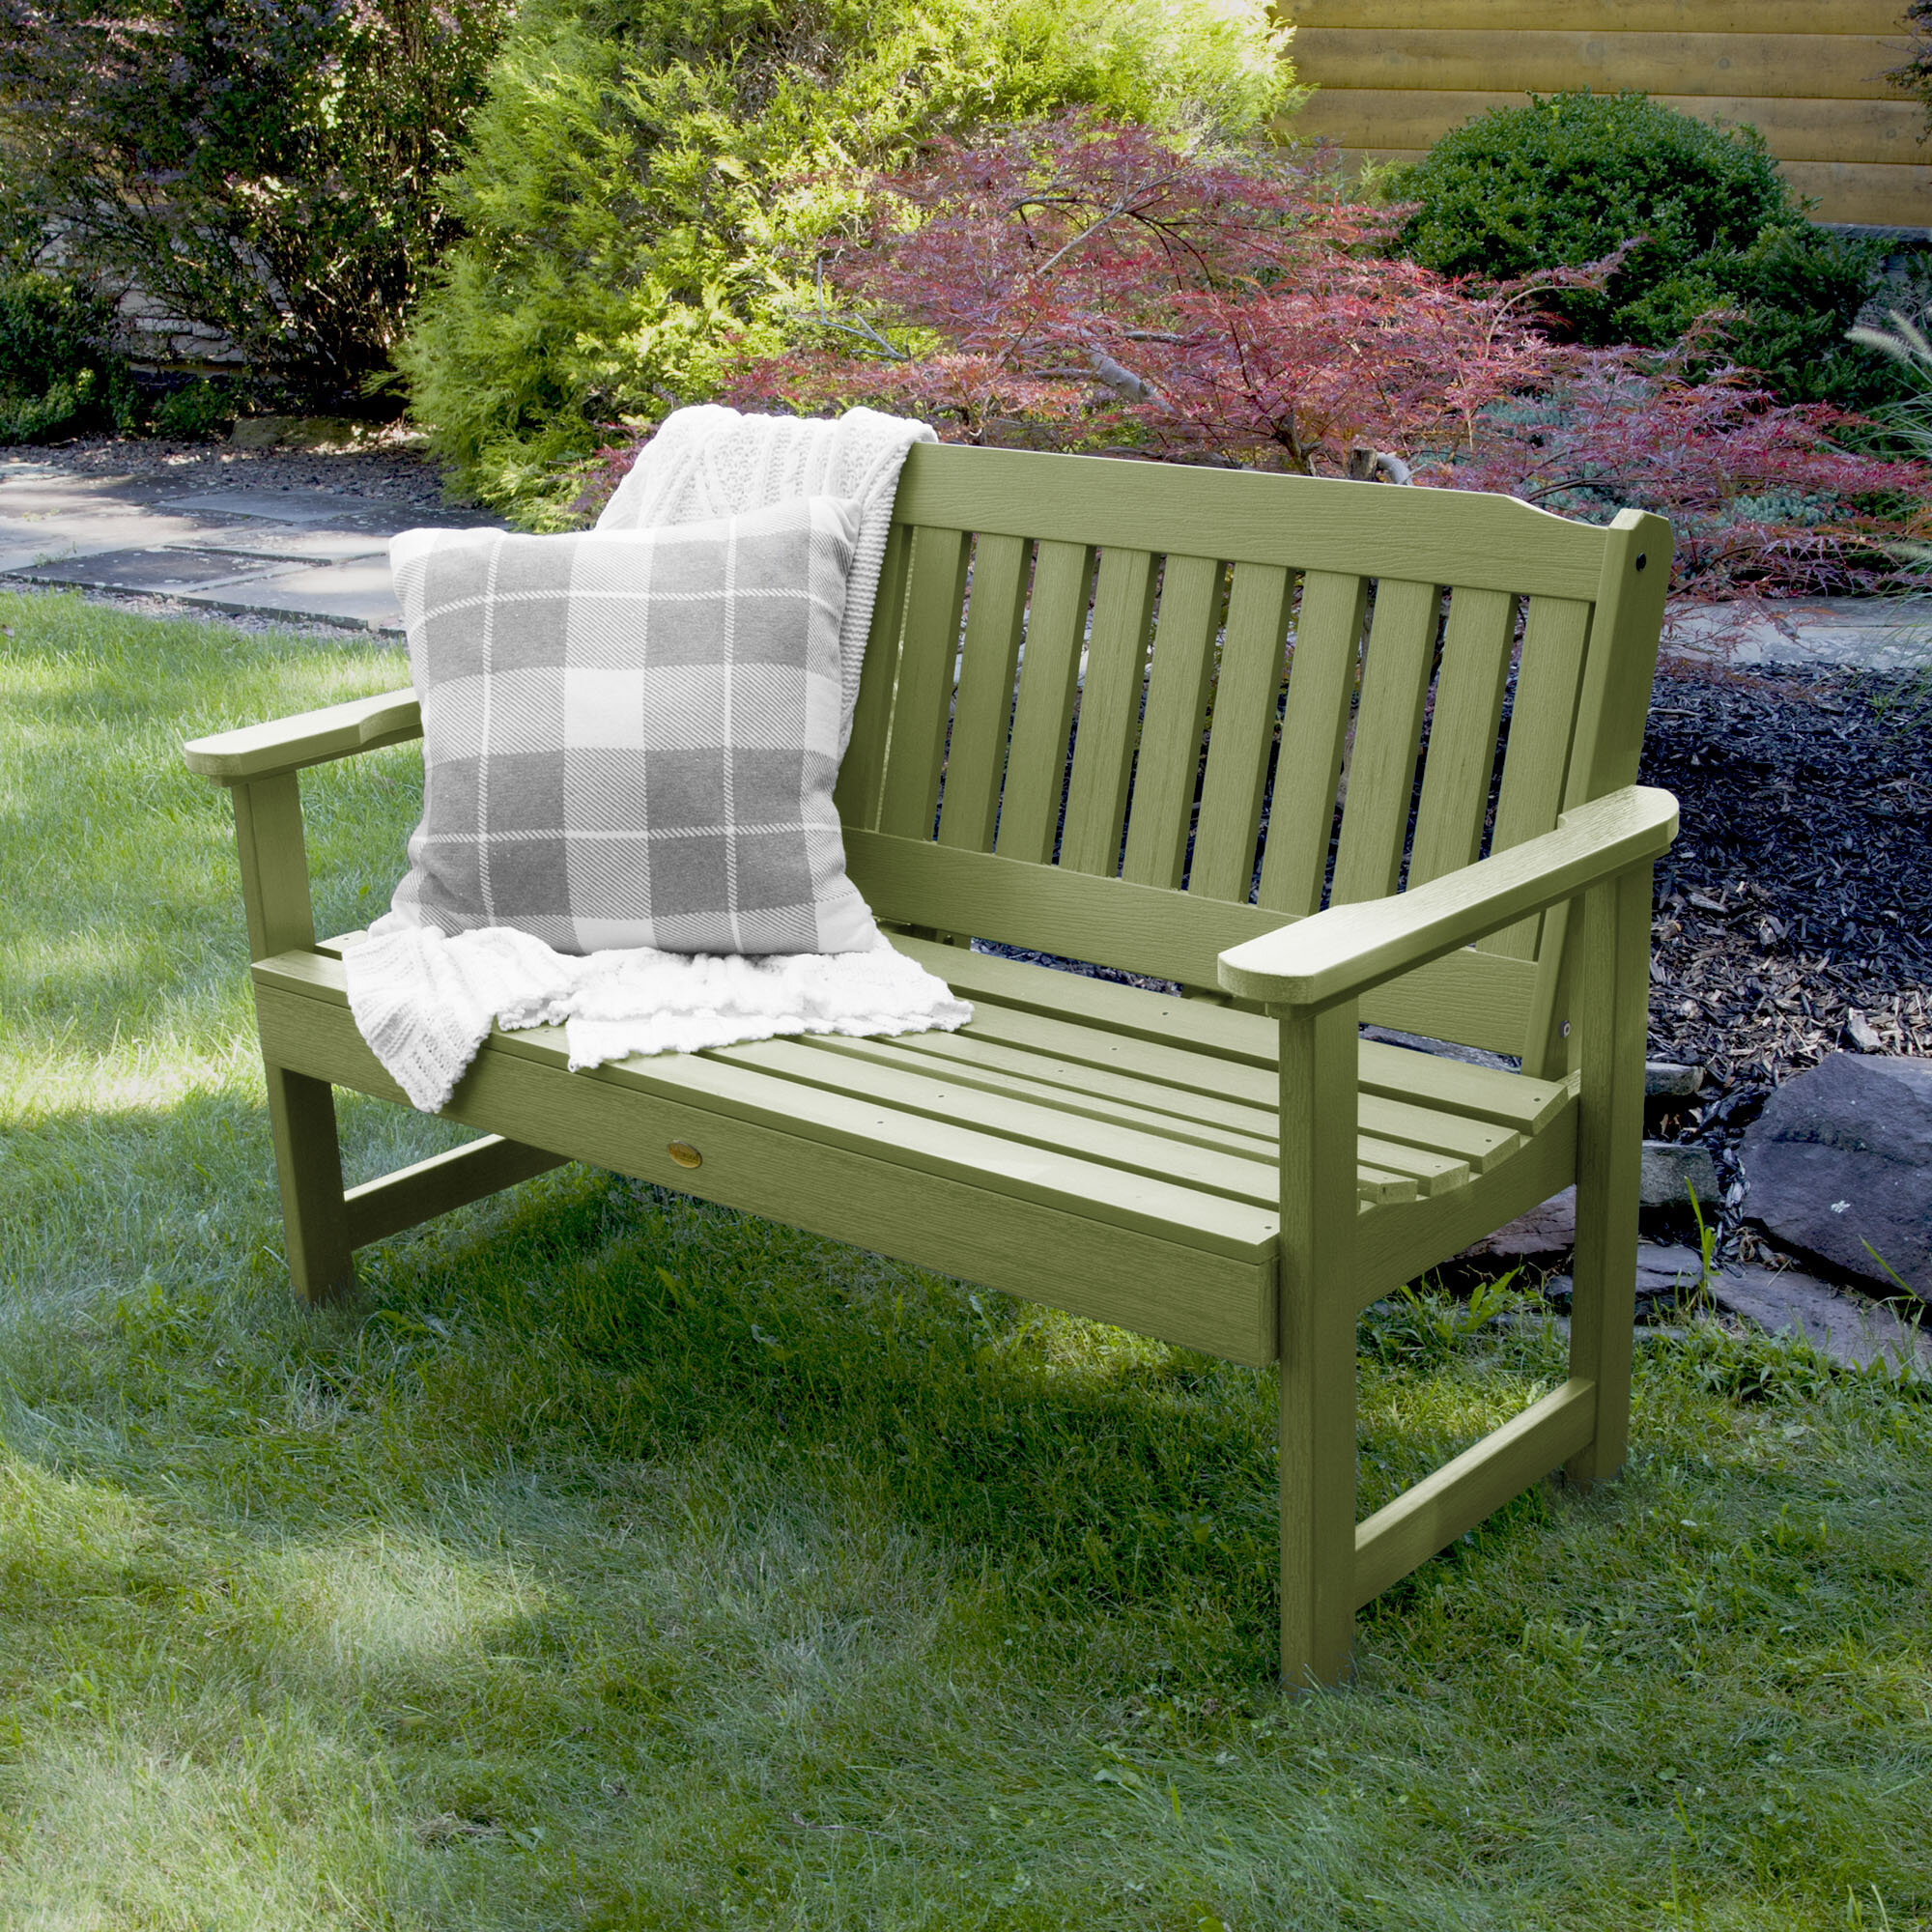 Amelia Plastic Garden Bench & Reviews | Birch Lane For Alfon Wood Garden Benches (View 15 of 25)